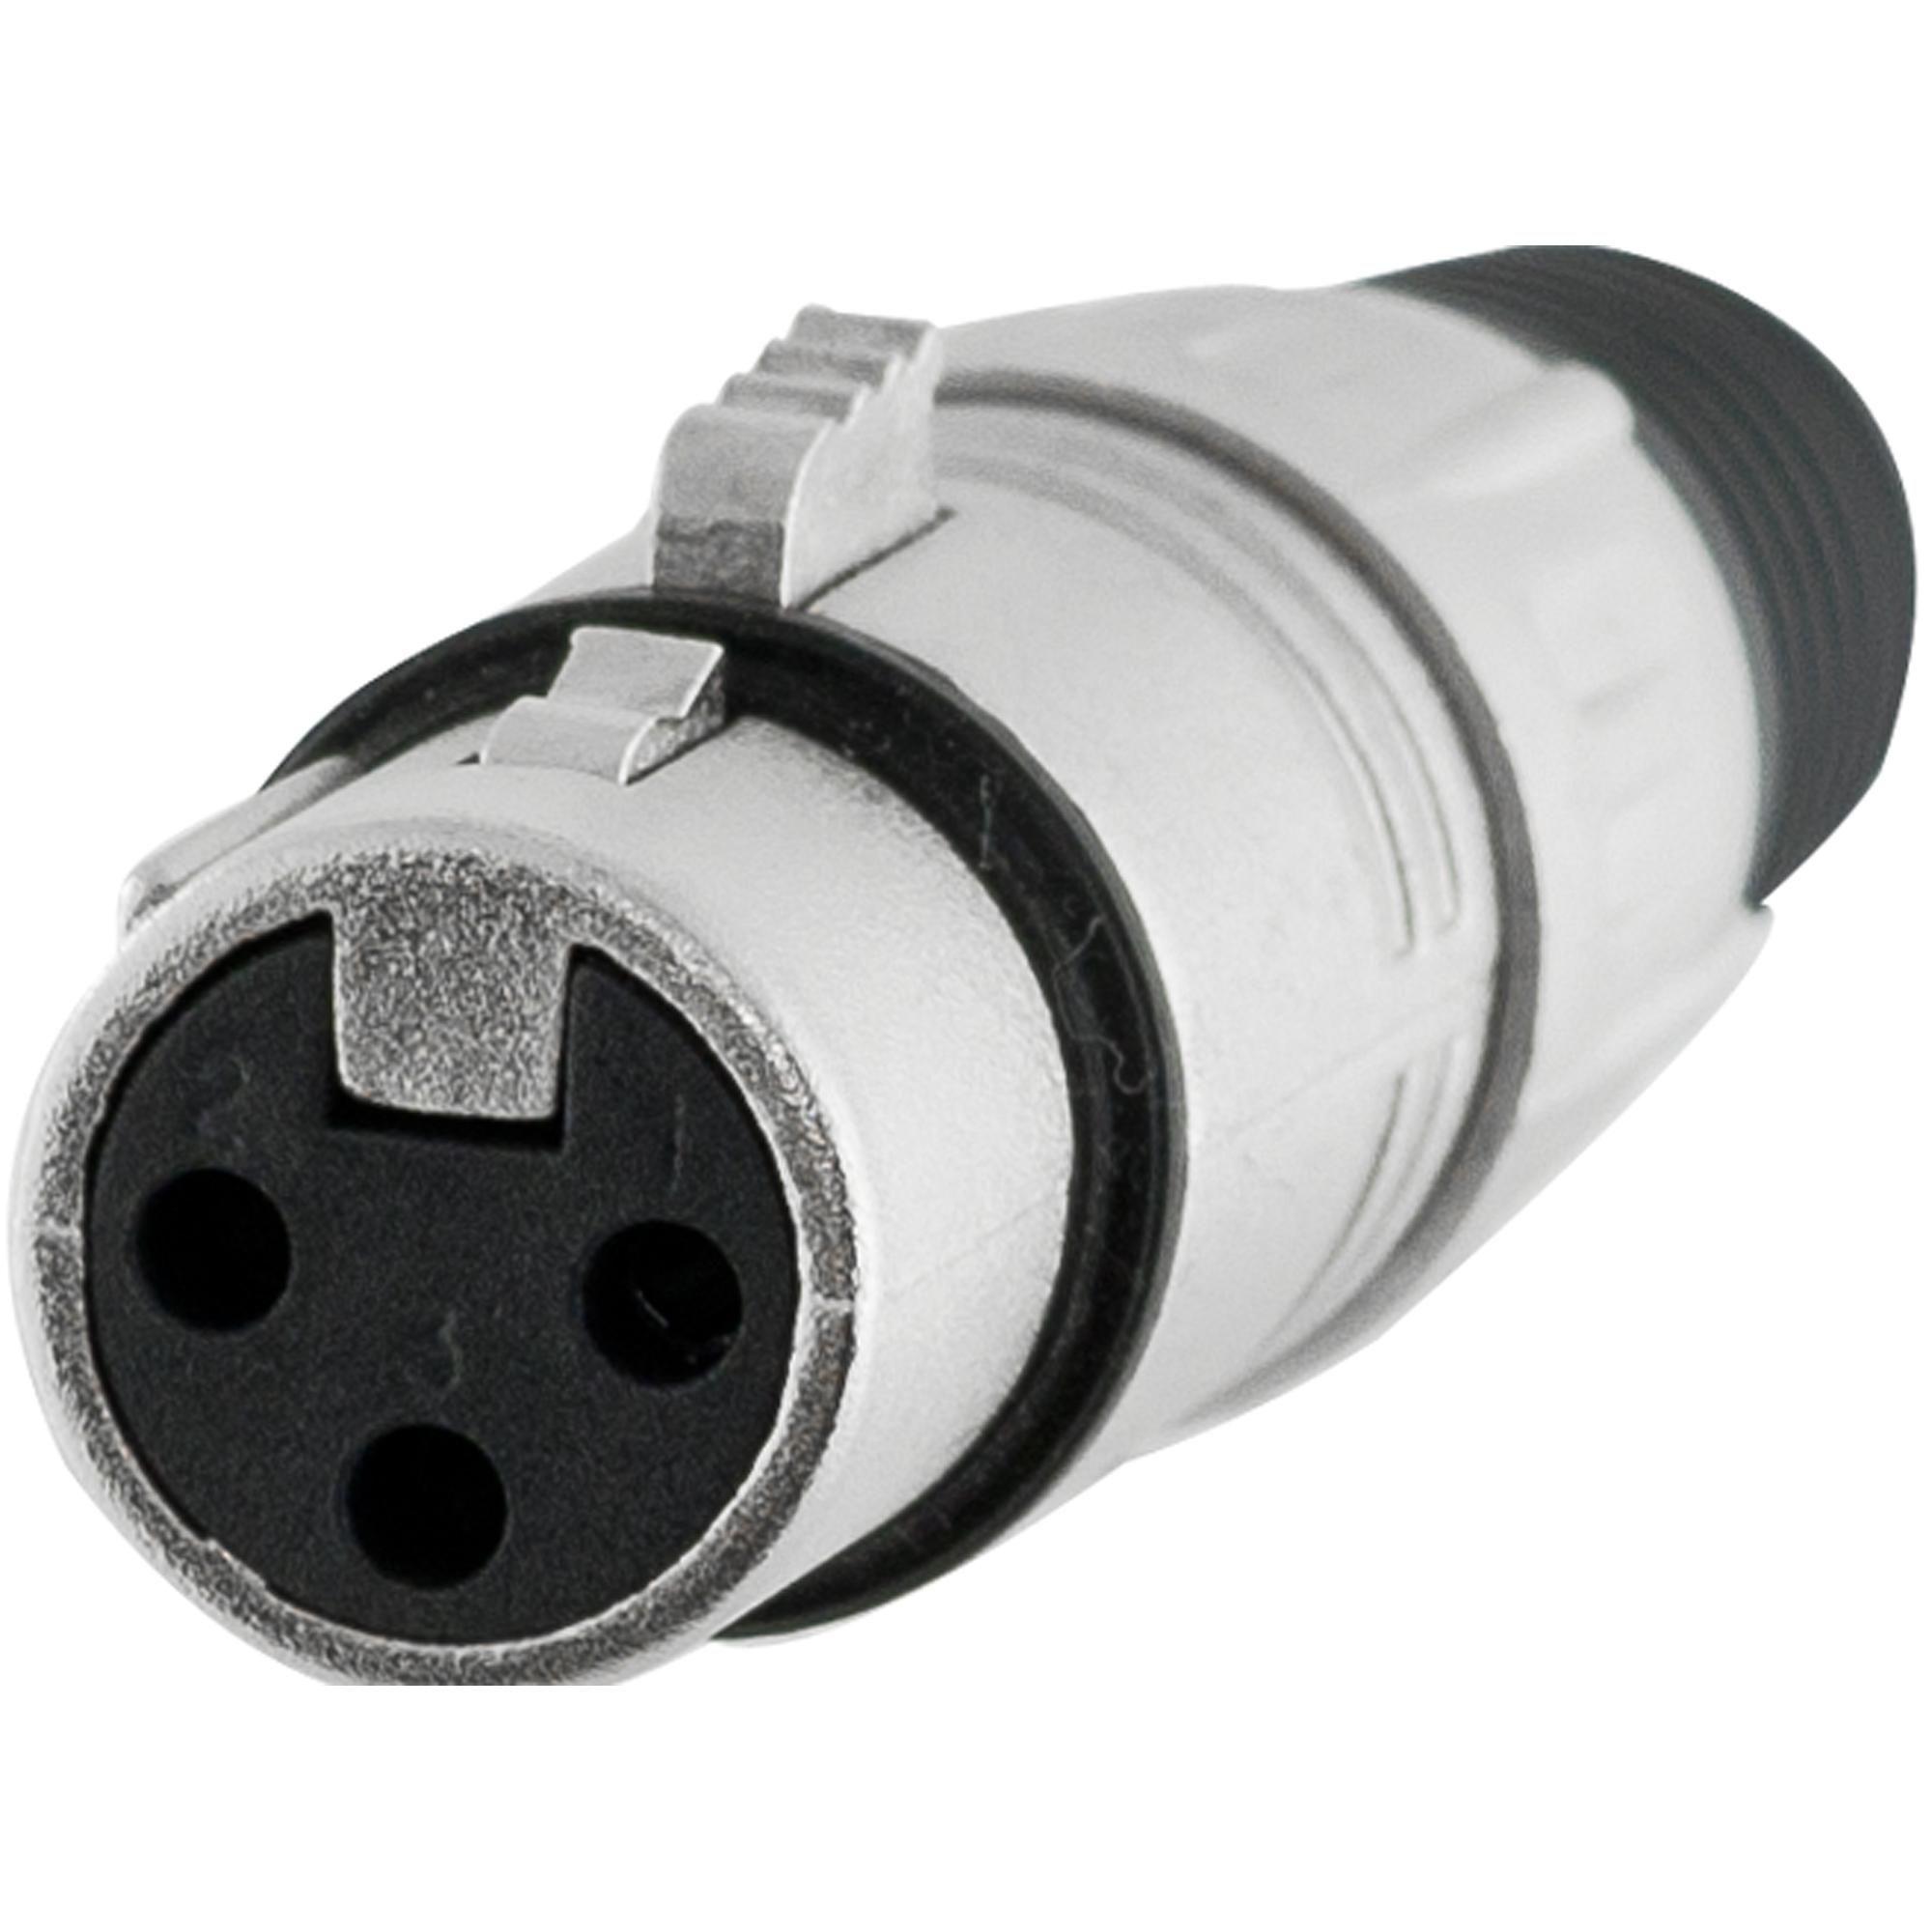 Conector XLR Fêmea 3 Pólos Niquelado HX001F Hyx